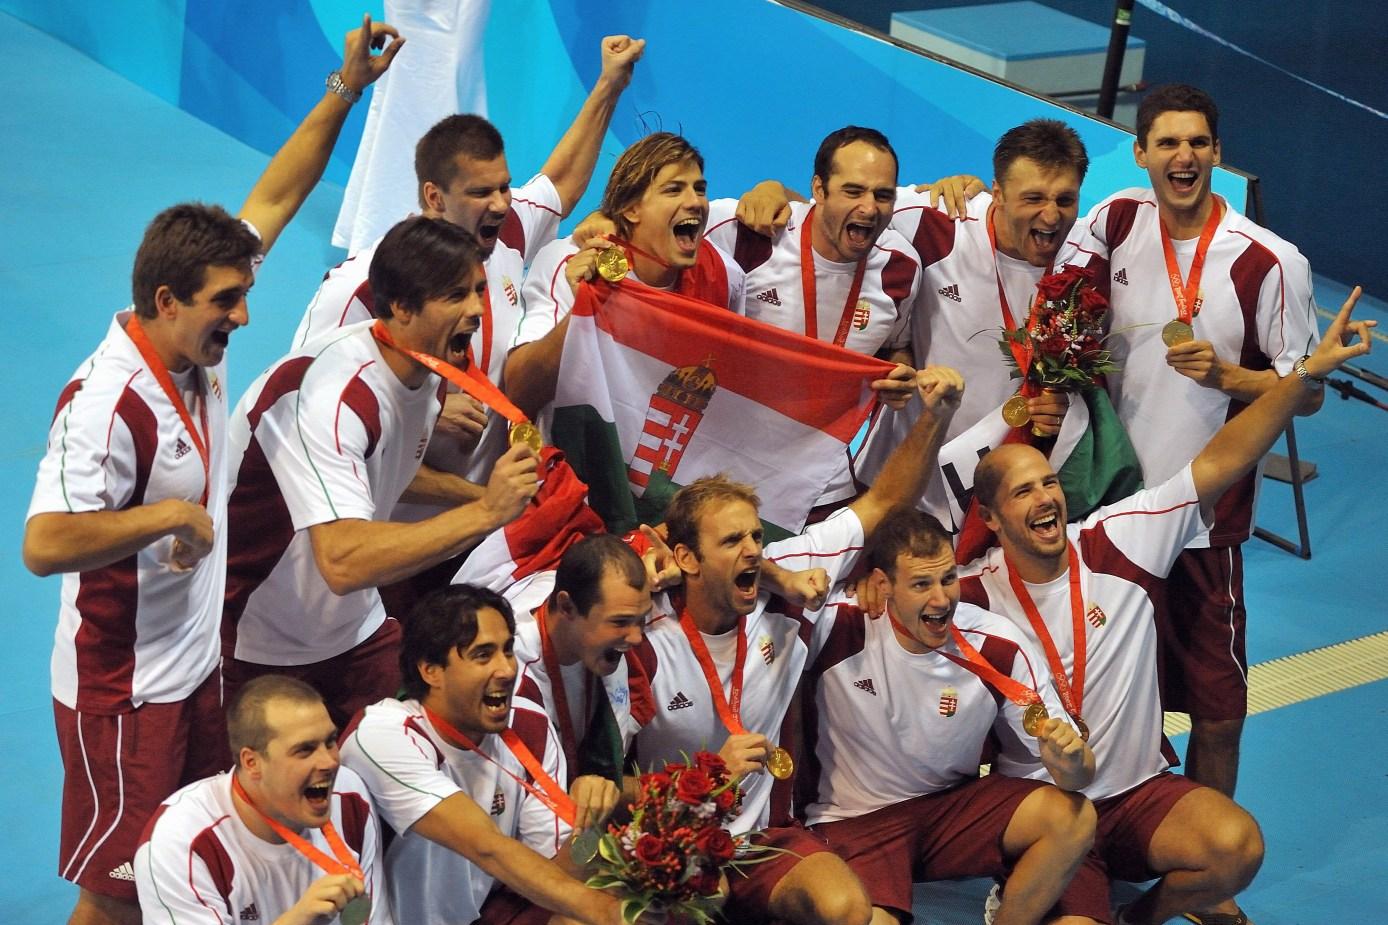 olimpiaibajnokvalogatott01